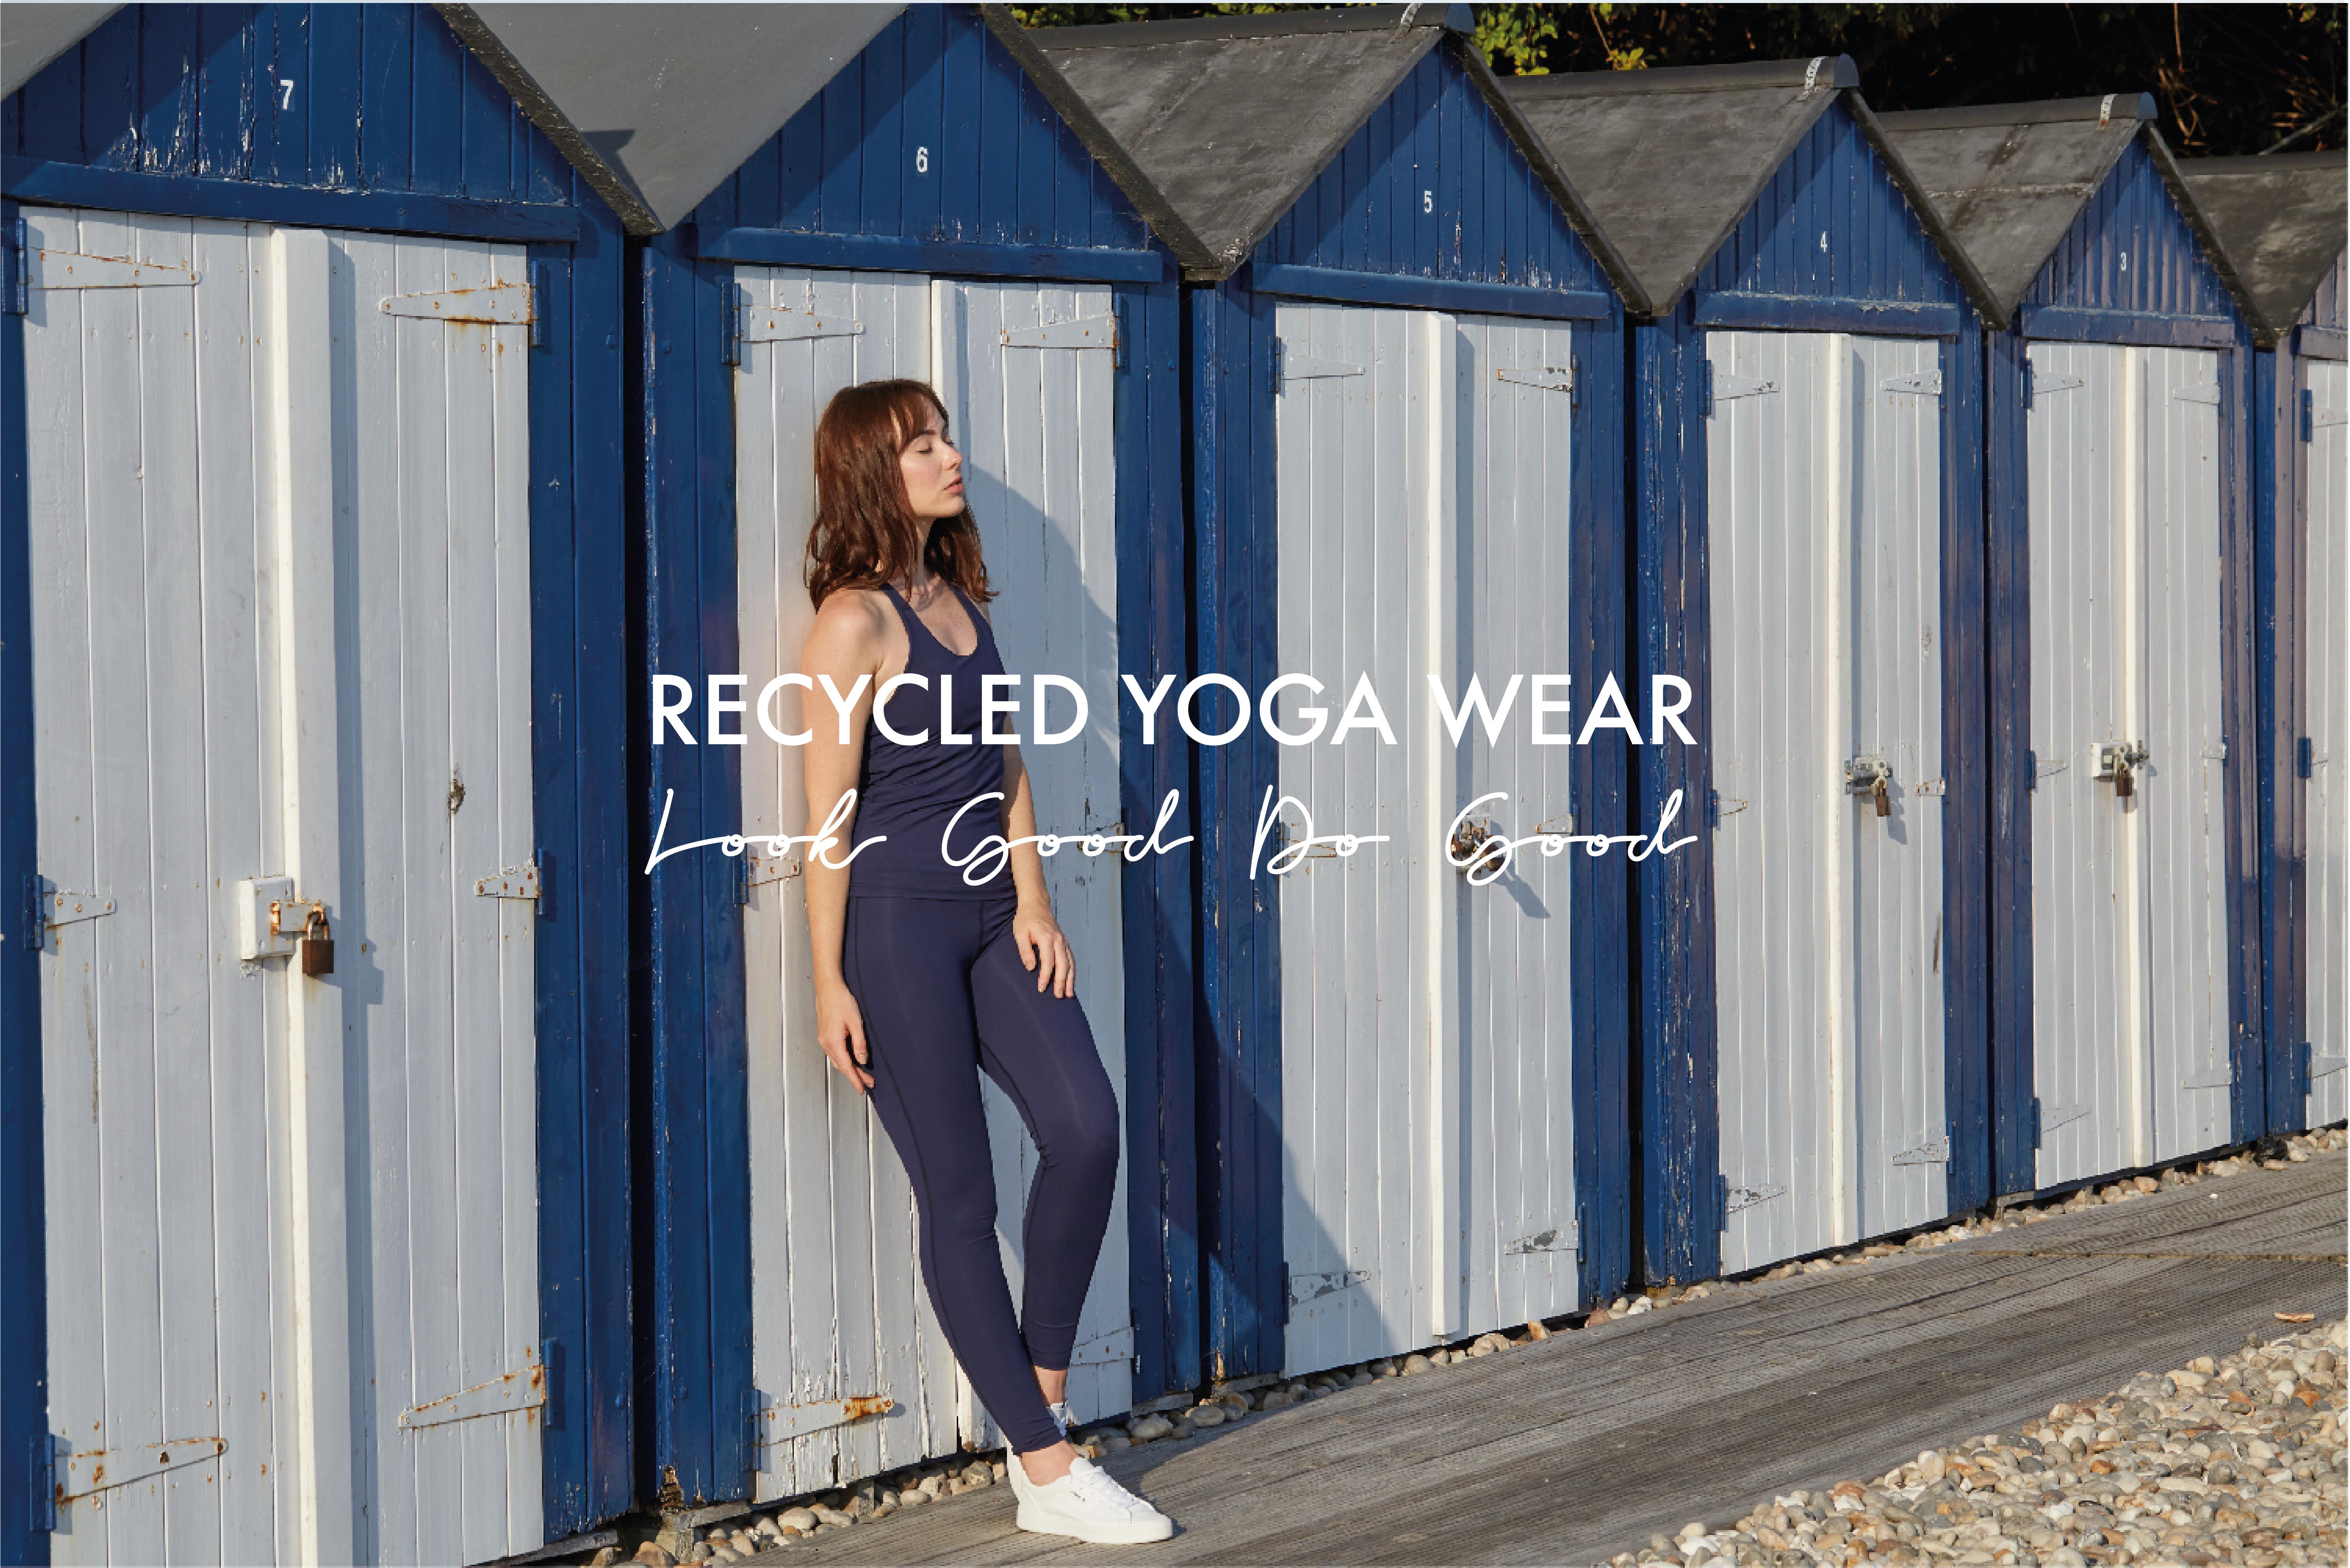 recycled yoga wear